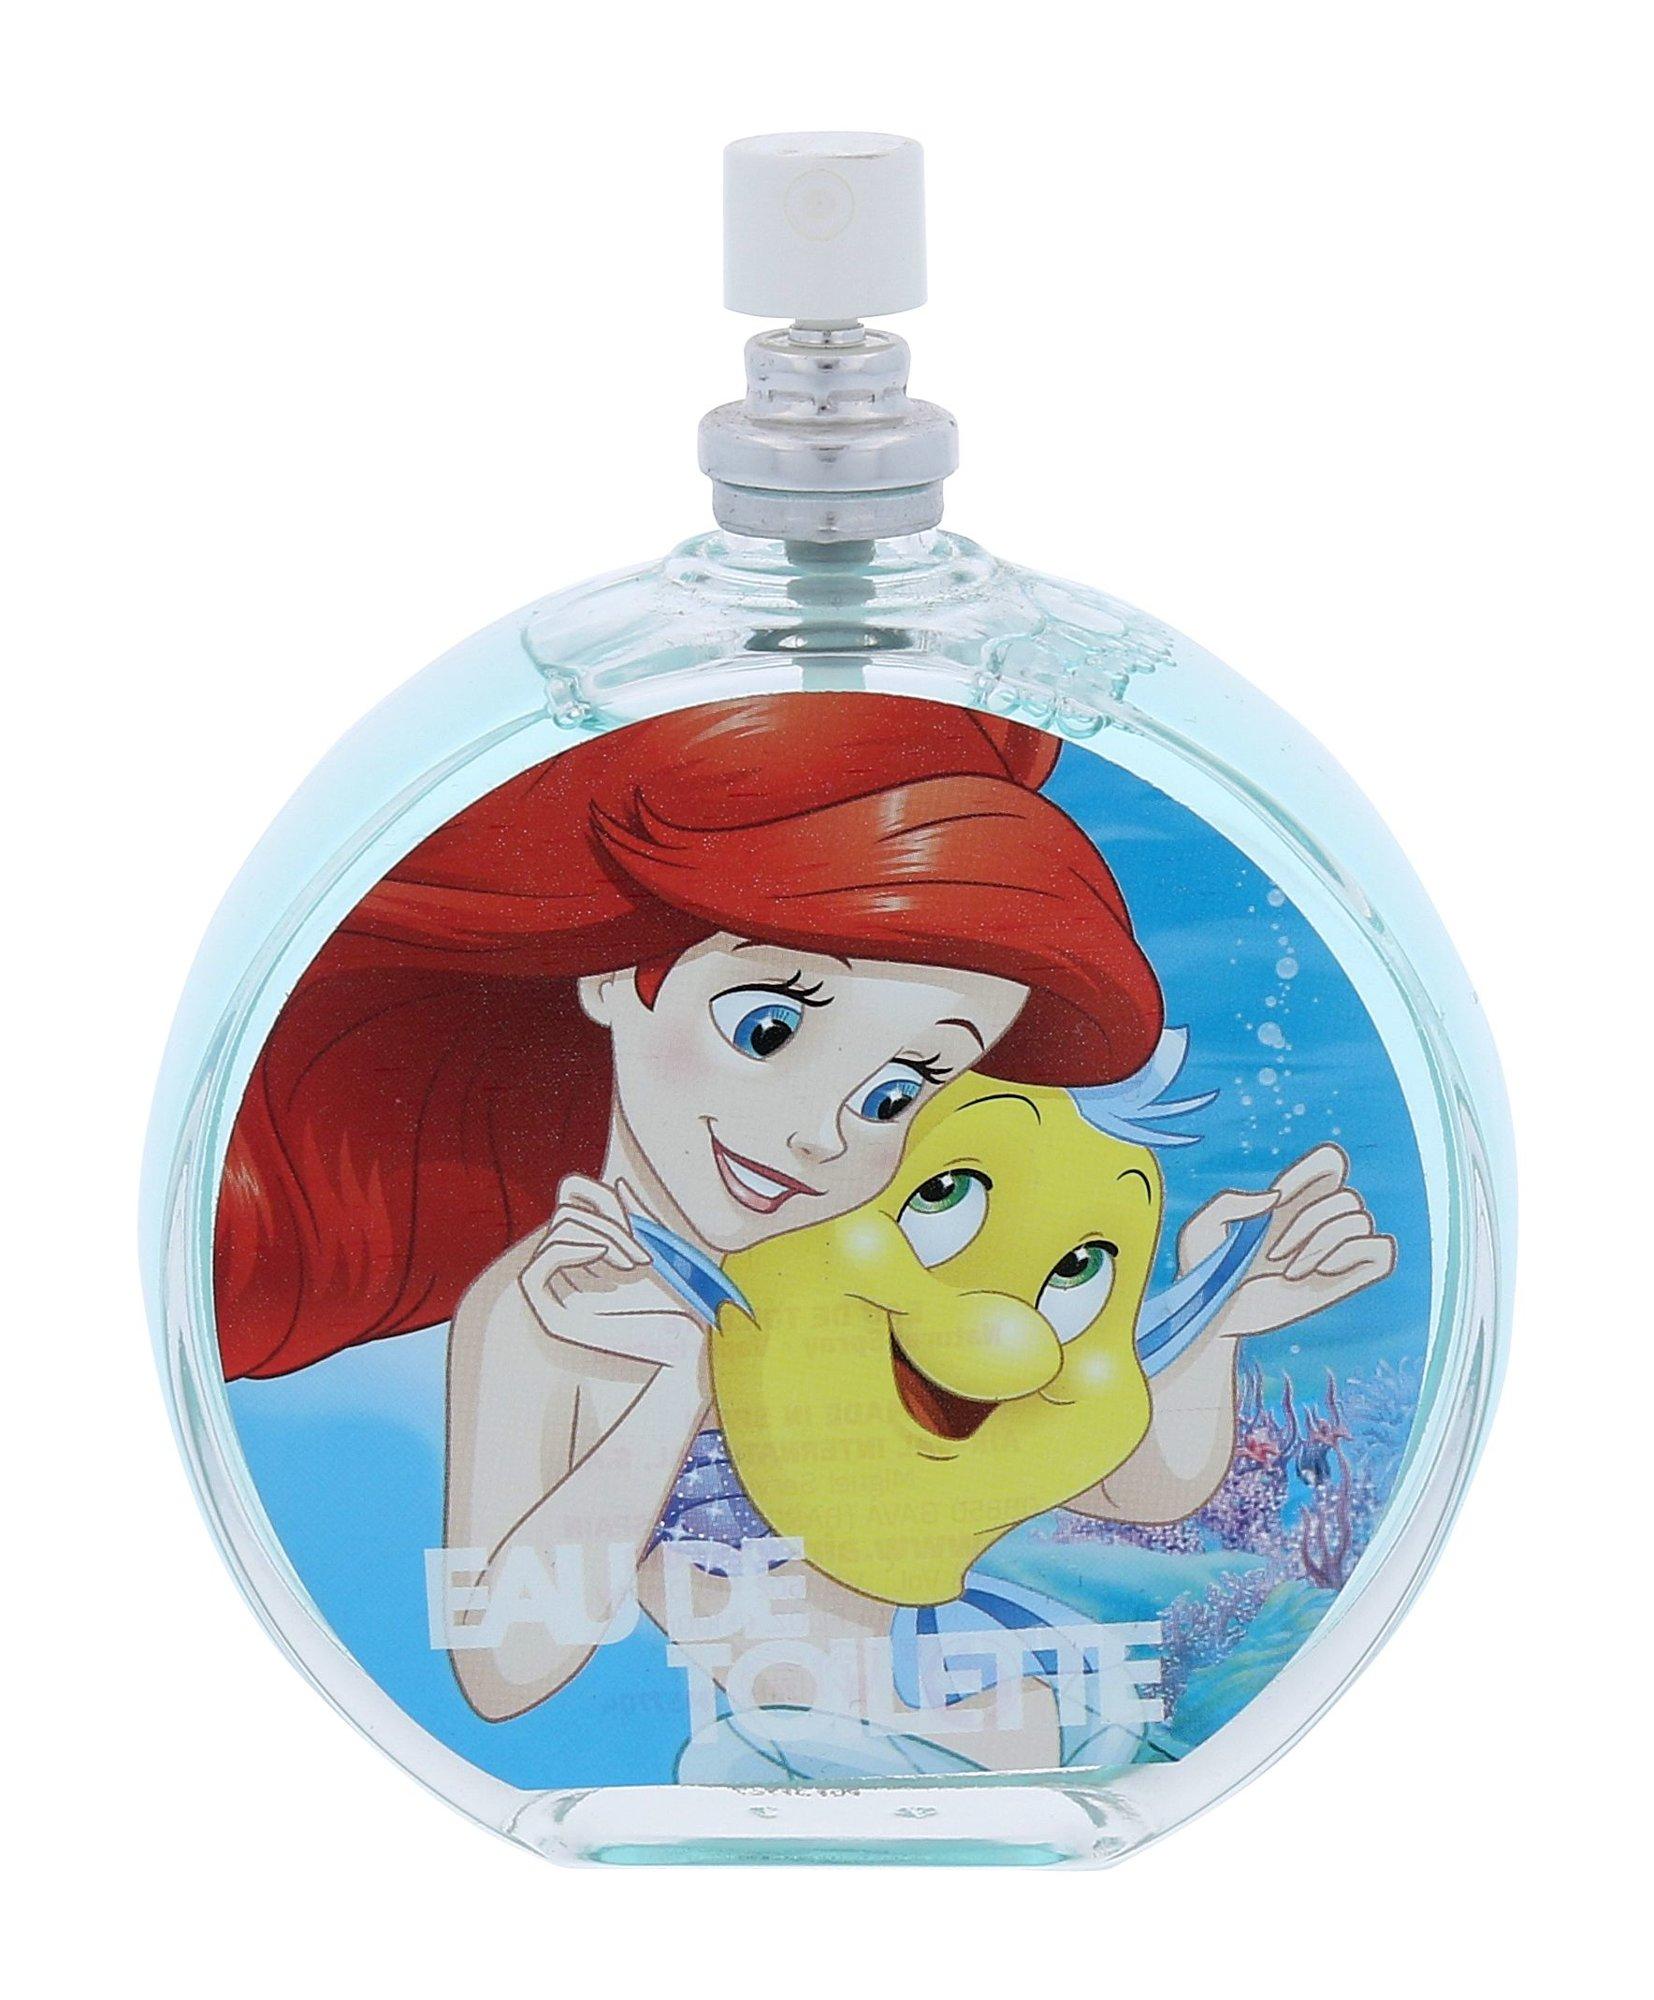 Disney Princess Ariel EDT 100ml